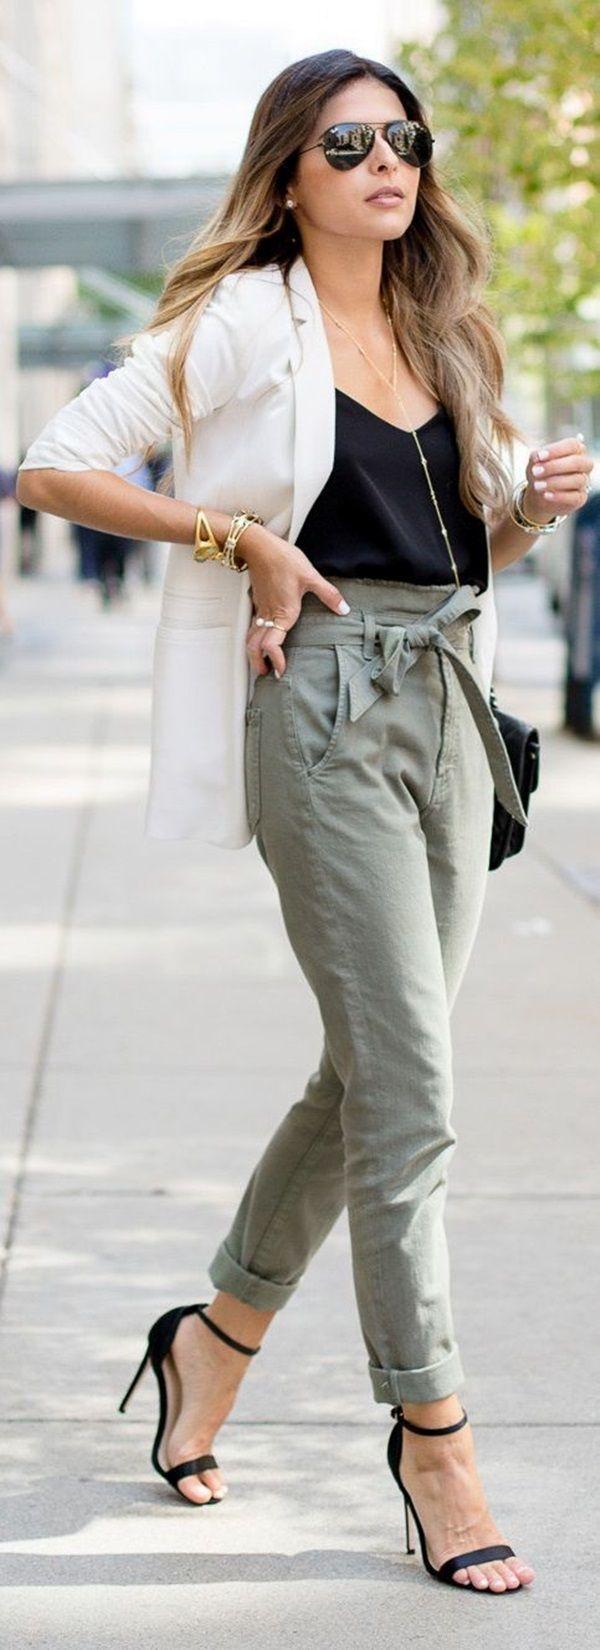 green-olive-joggers-pants-black-cami-white-jacket-blazer-black-shoe-sandalh-sun-black-bag-howtowear-fashion-style-outfit-spring-summer-hairr-work.jpg